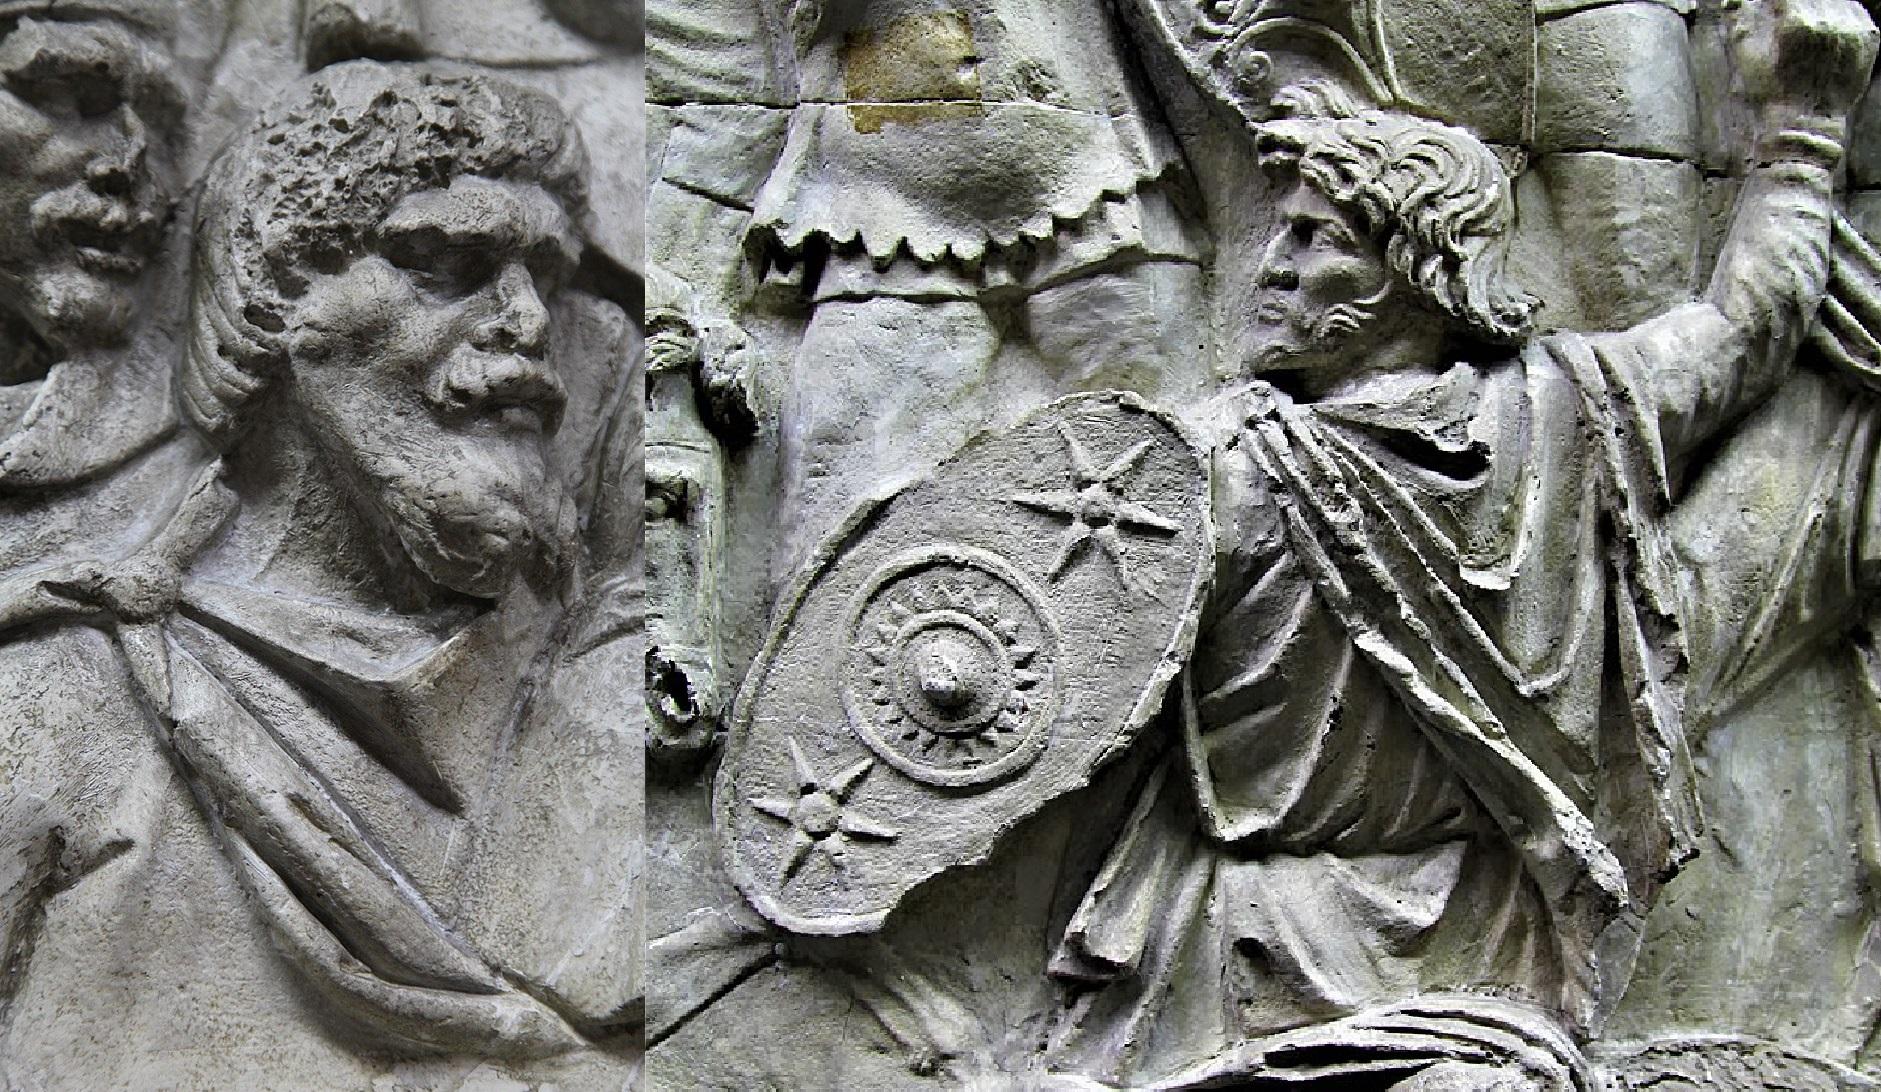 800px-Columna_lui_Traian,_Roma_-_detaliu-_Portret_de_razboinic_Dac